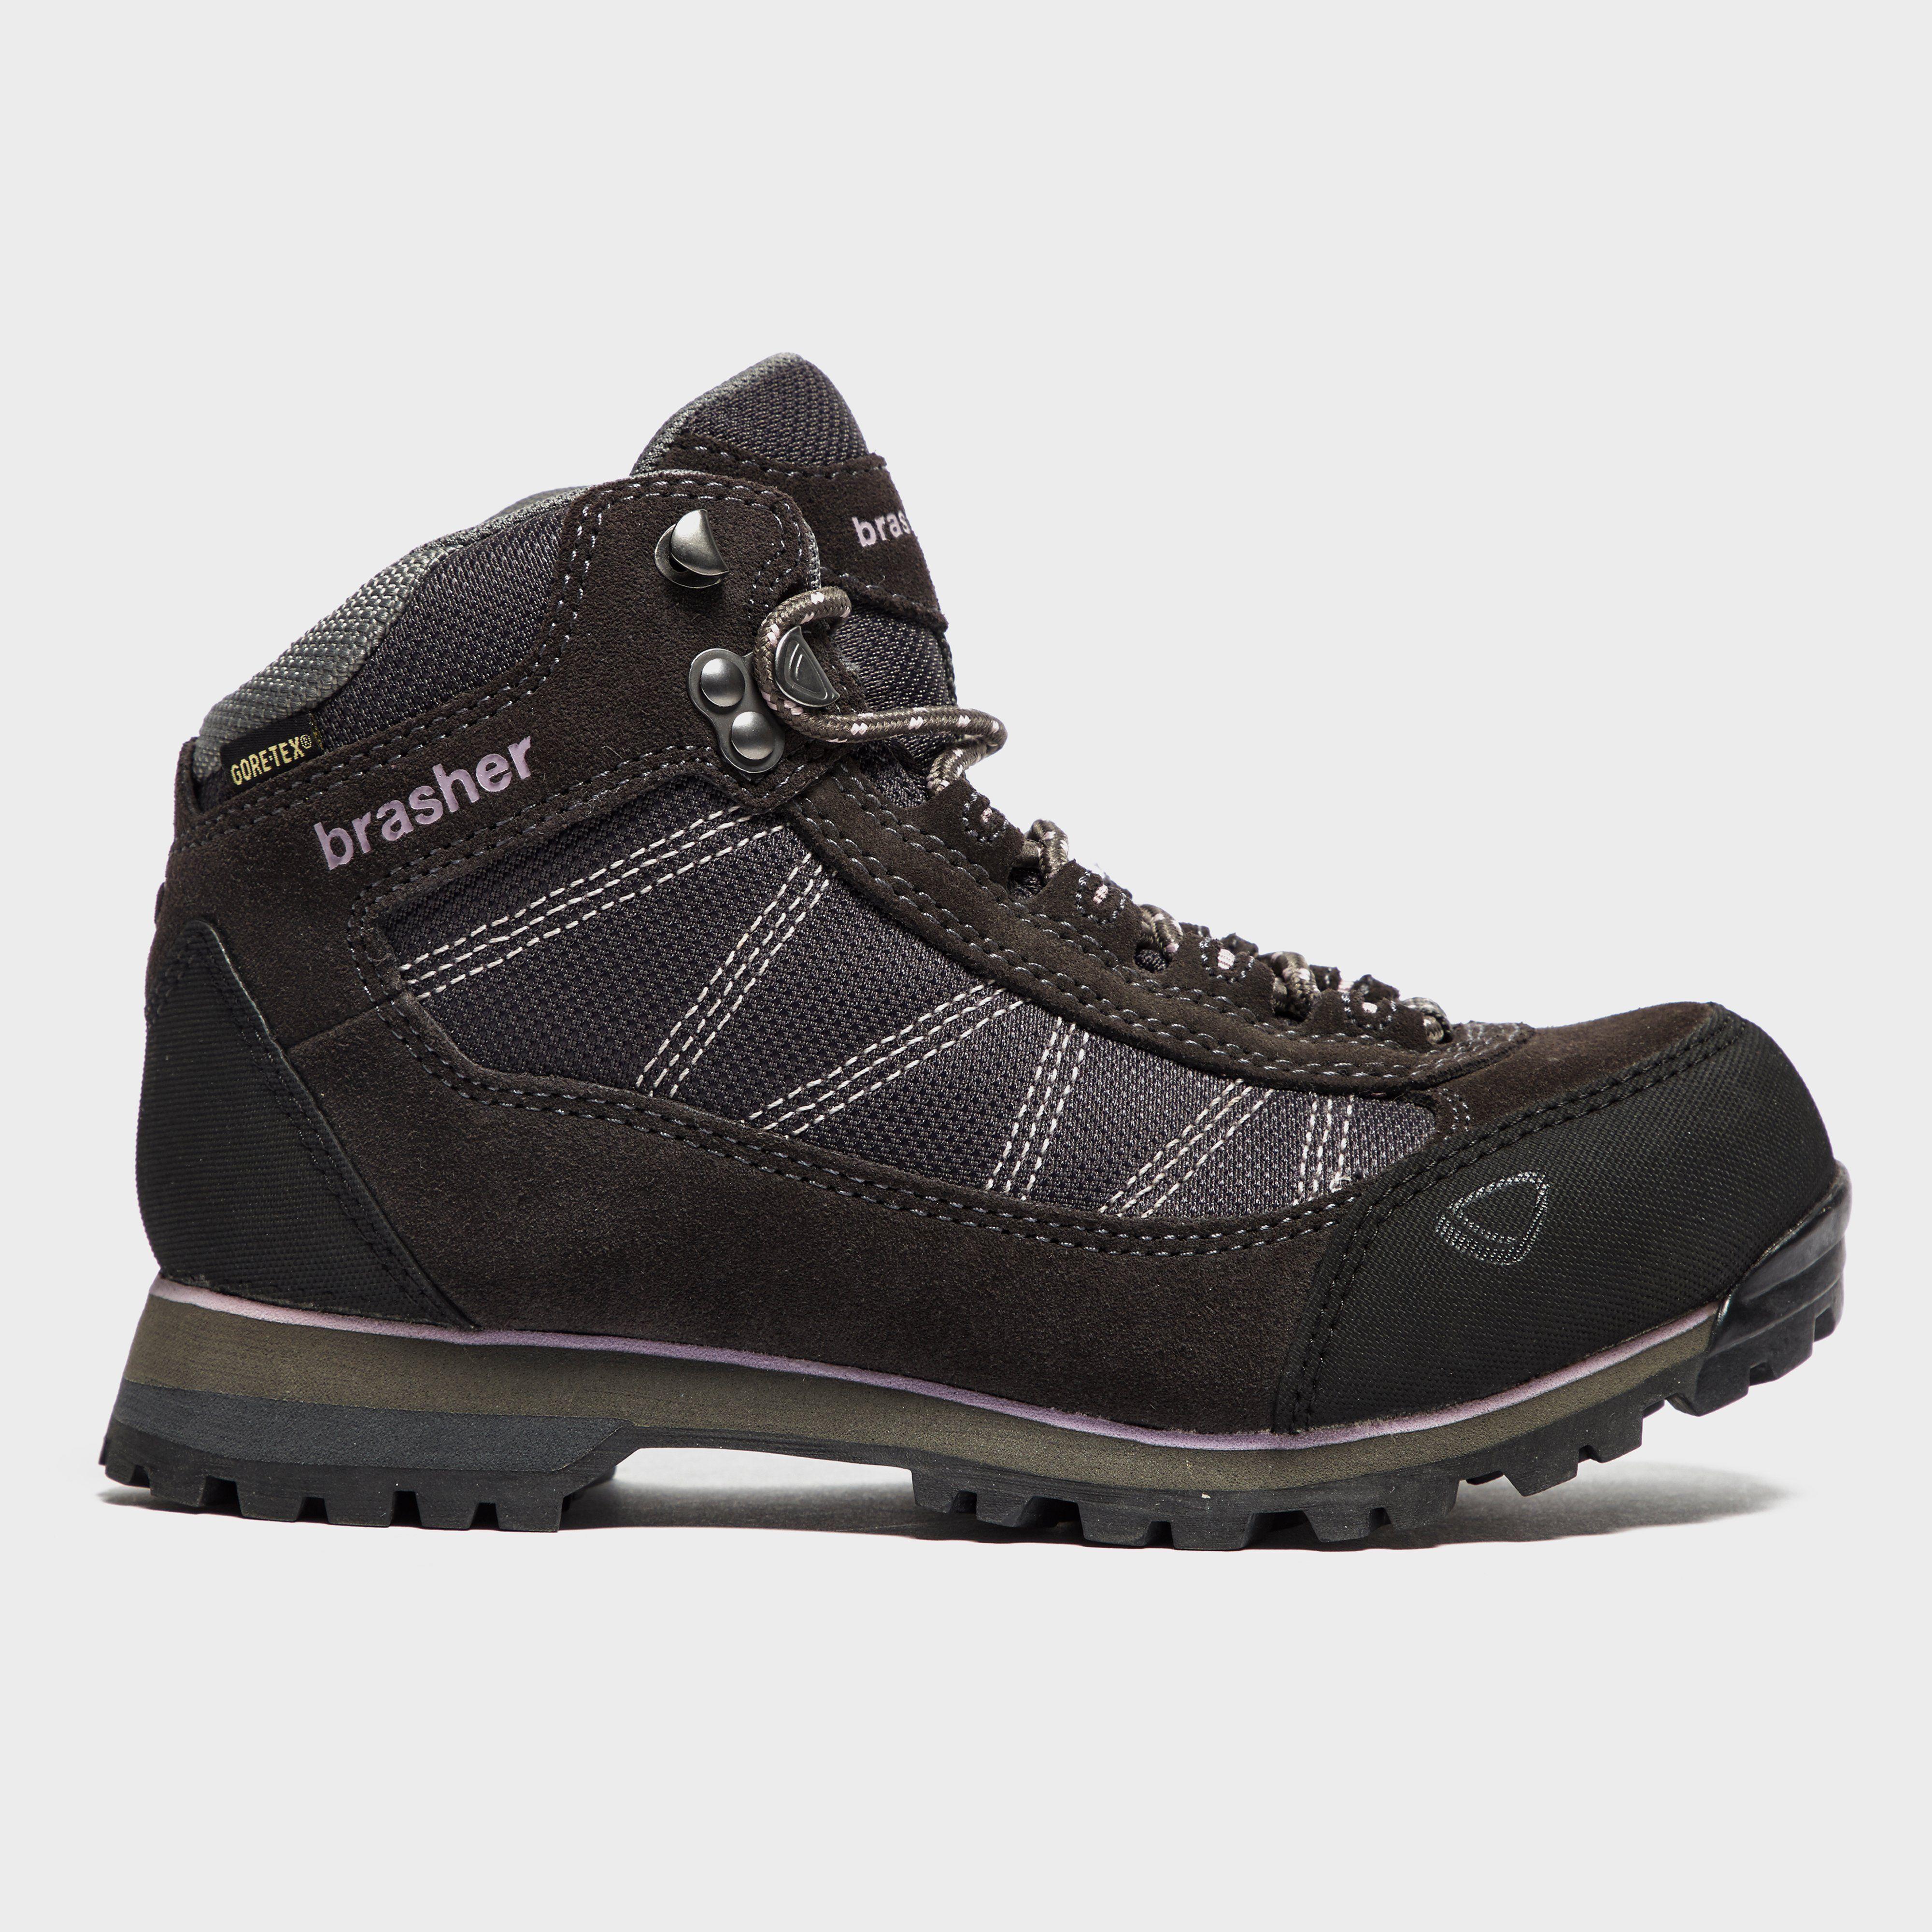 BRASHER Women's Kenai GTX® Walking Boots